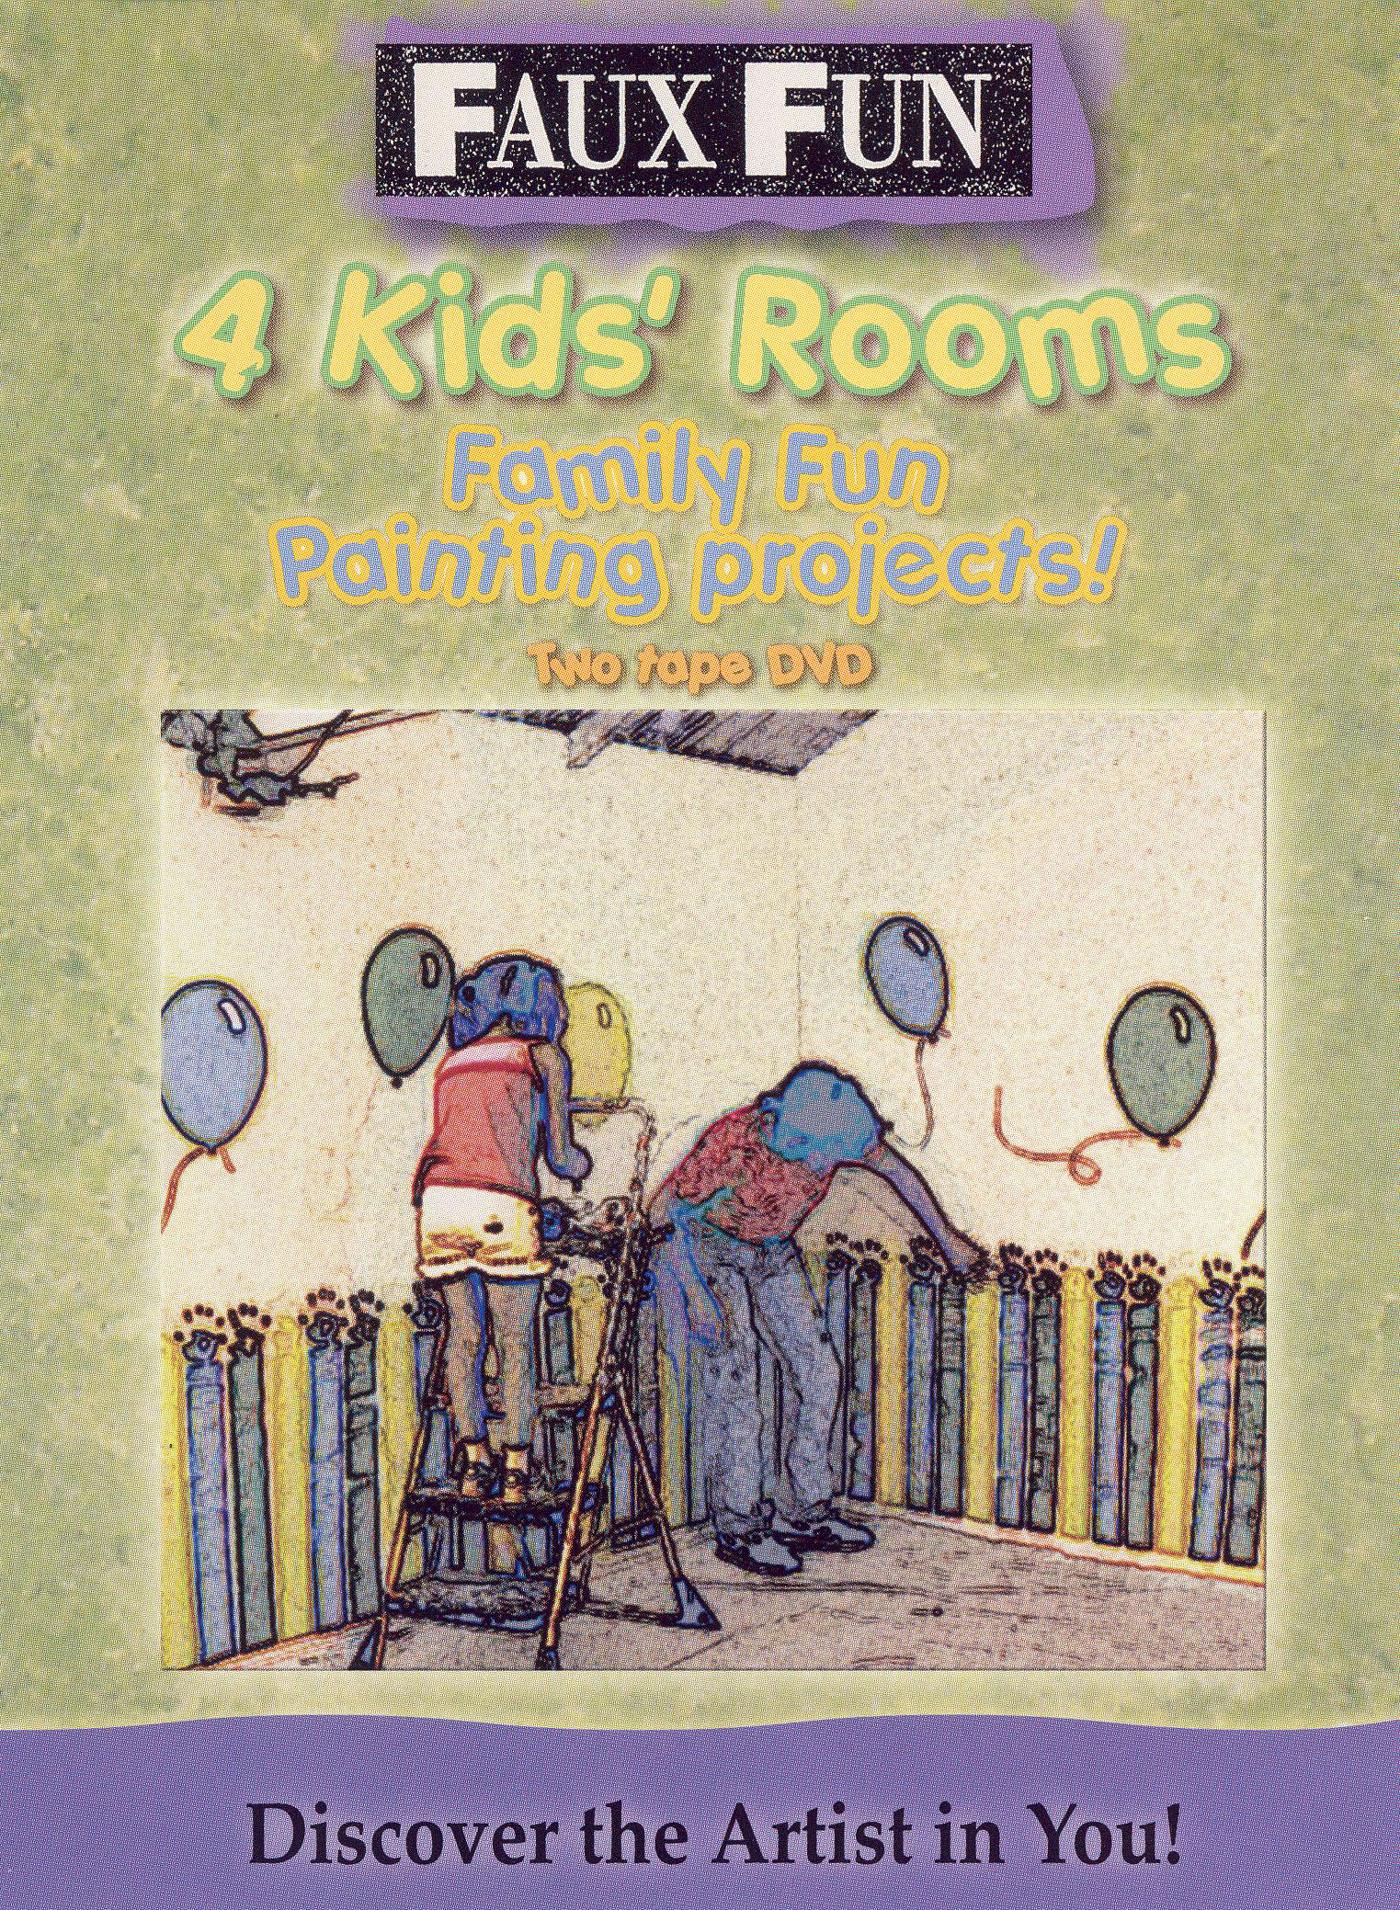 Faux Fun: 4 Kids Rooms